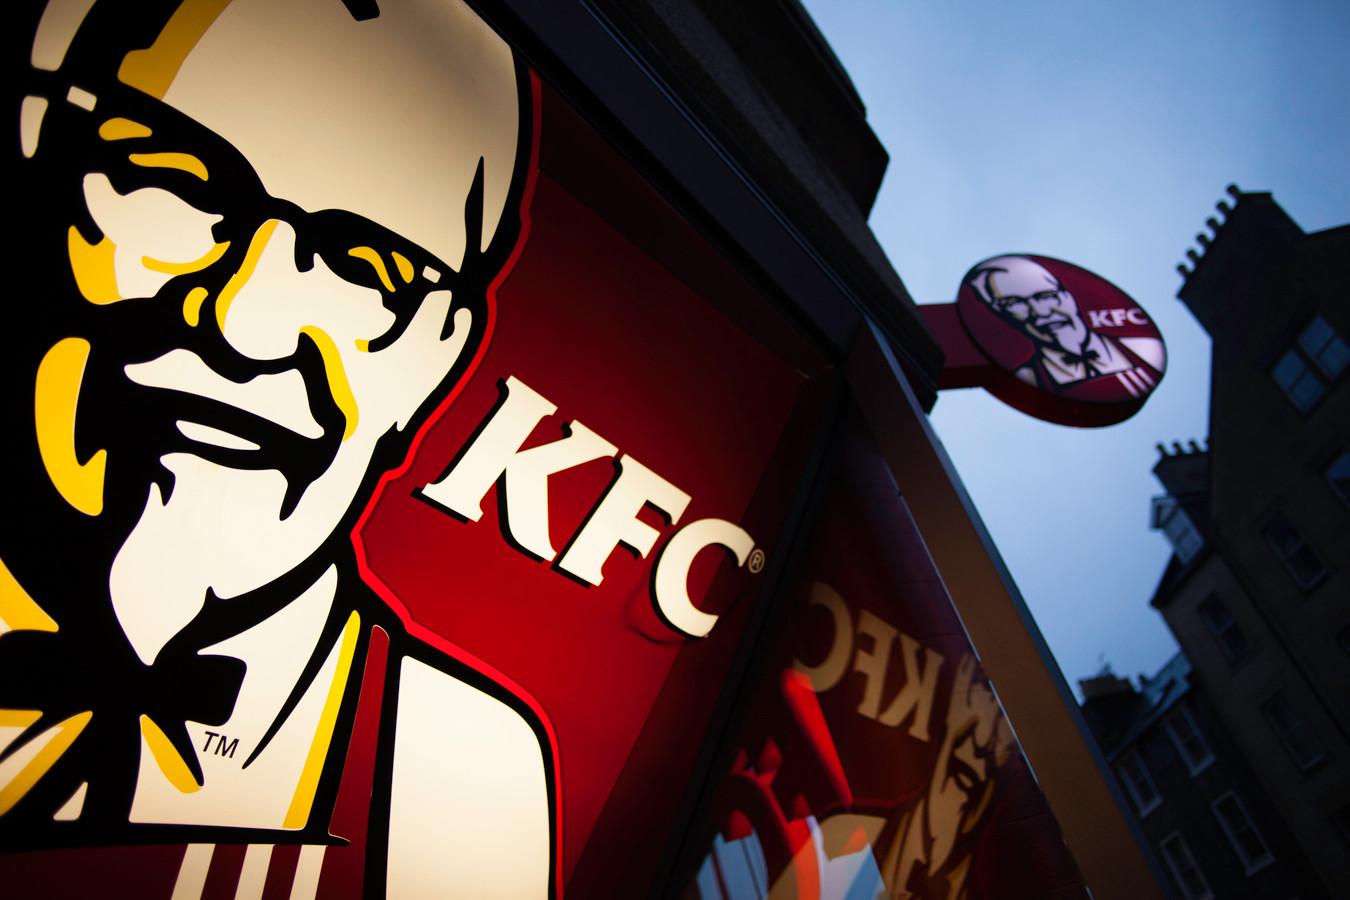 KFC opent filiaal in Helmond.